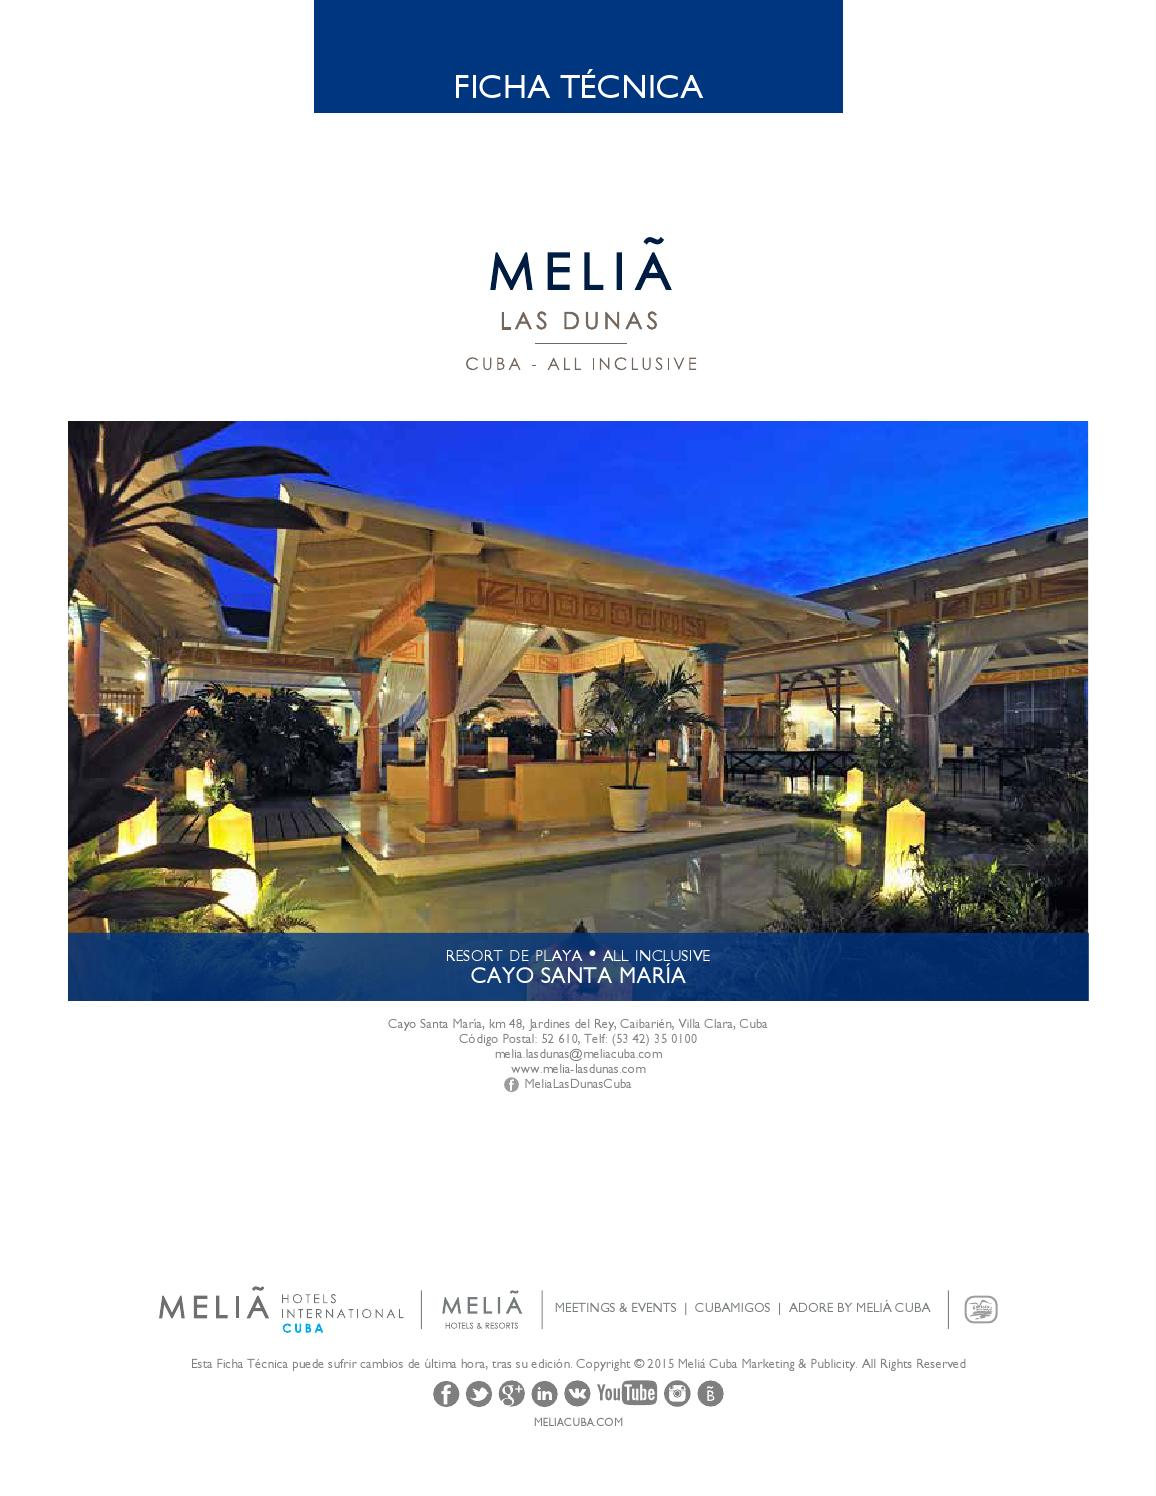 Ficha Técnica Hotel Meliá Las Dunas By Erick Issuu